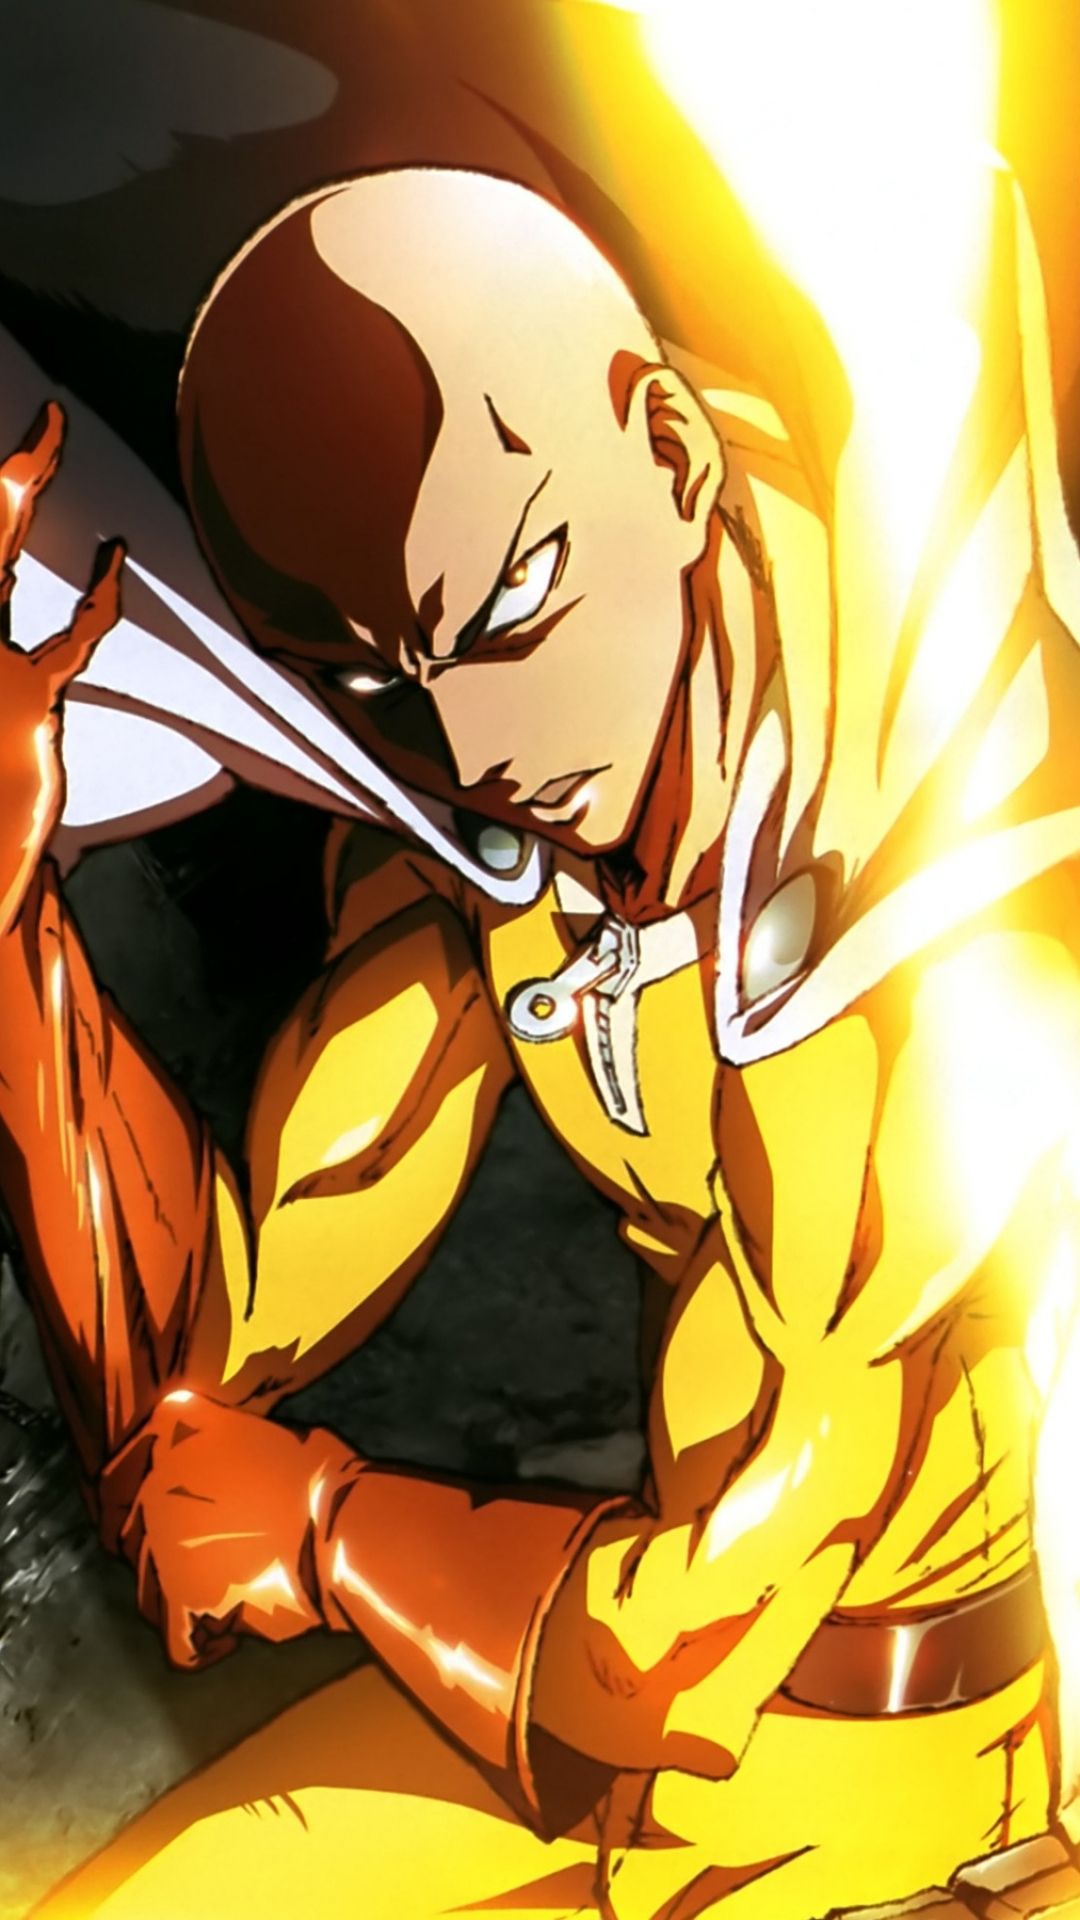 HD Wallpaper 25 Anime, Imagem de anime, Saitama